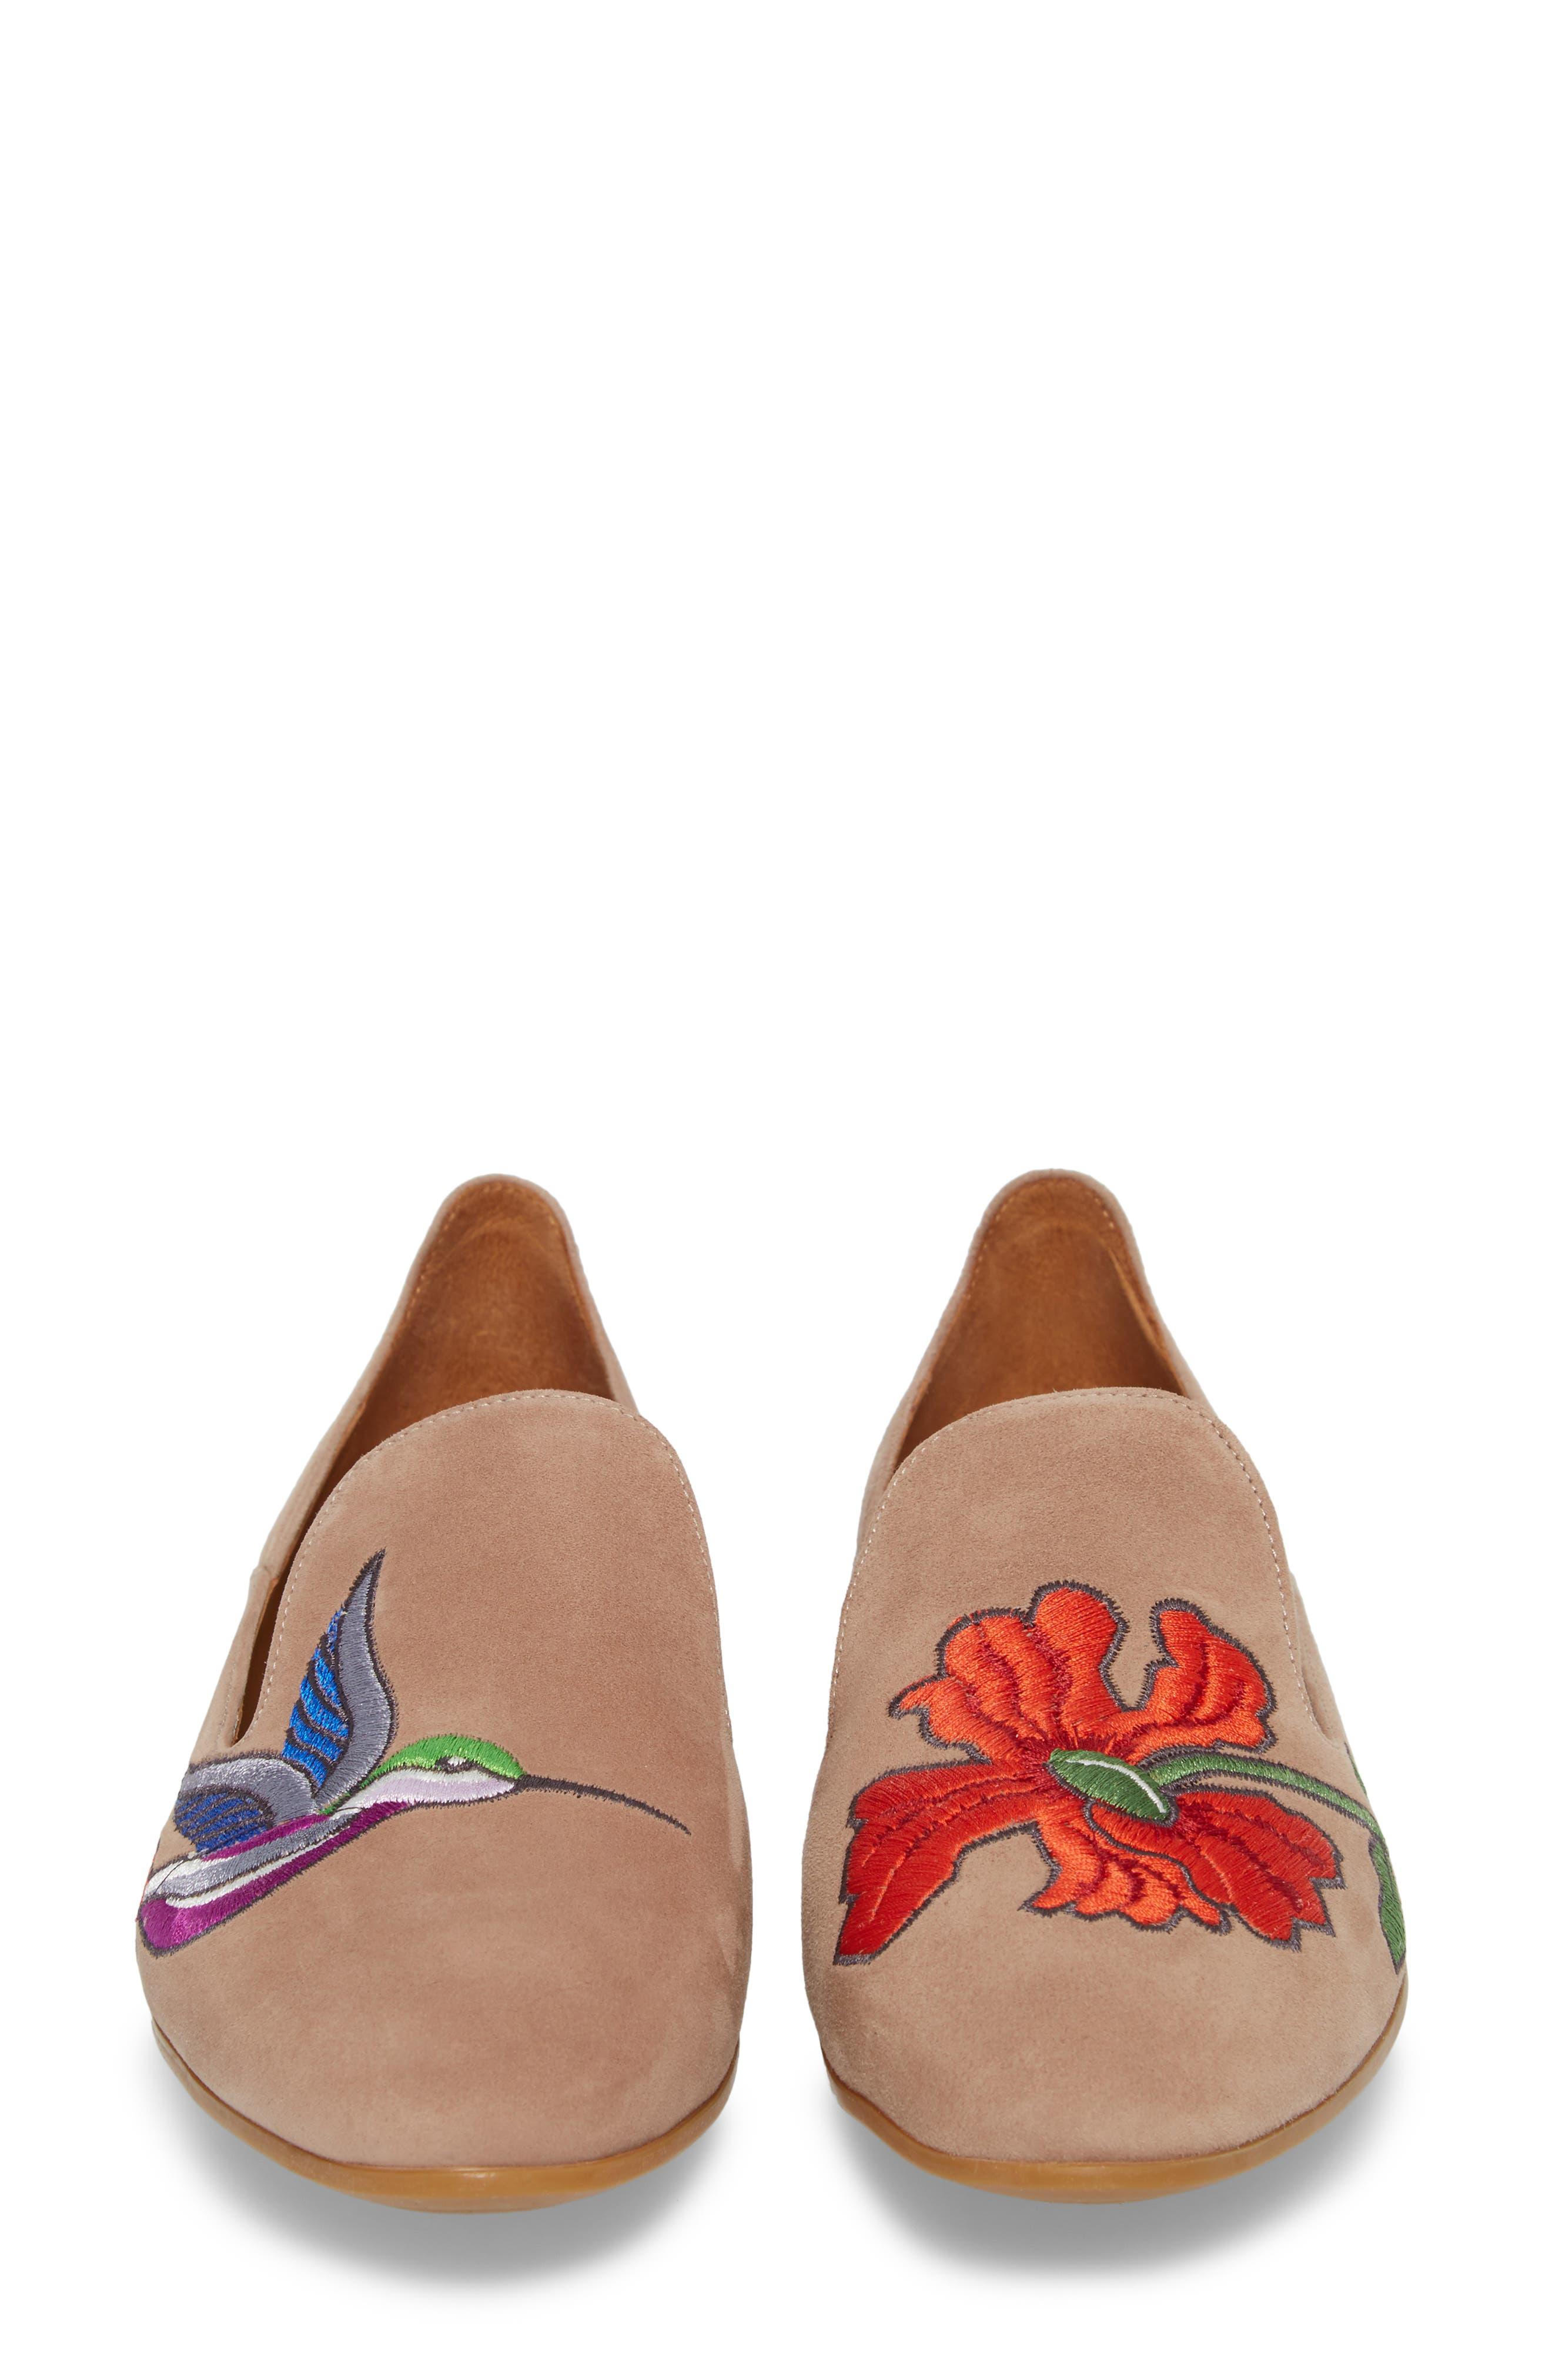 Emmaline Embroidered Loafer,                             Alternate thumbnail 5, color,                             Nude